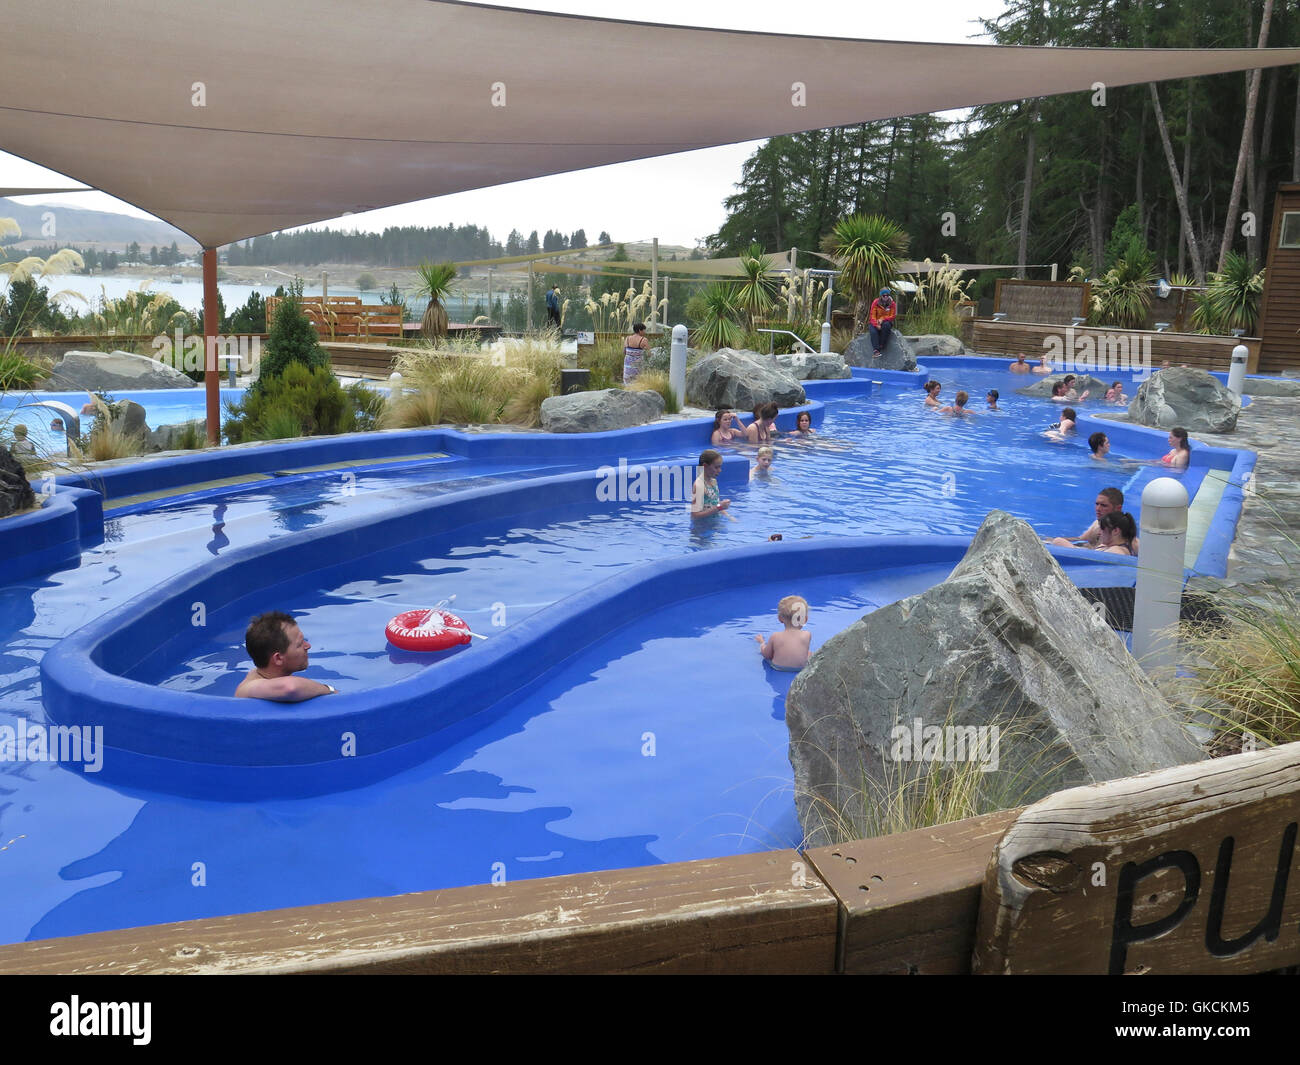 Alps Pools West Island